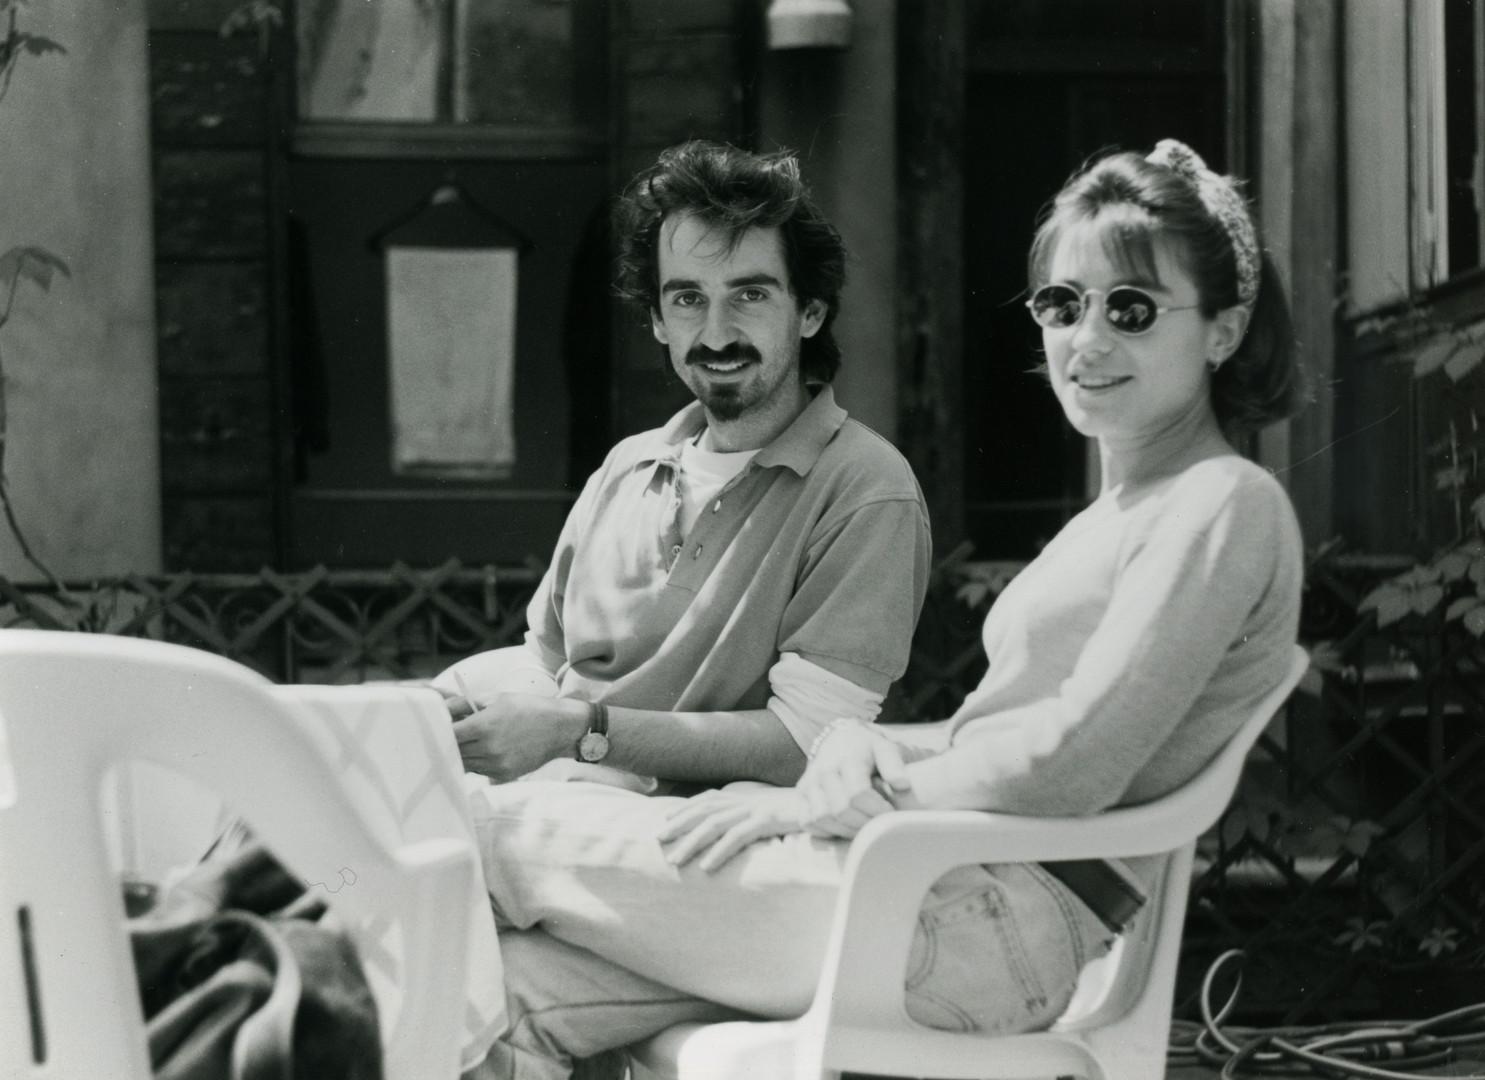 Joël Mestre y Elvira Querol (Venecia, 1994)